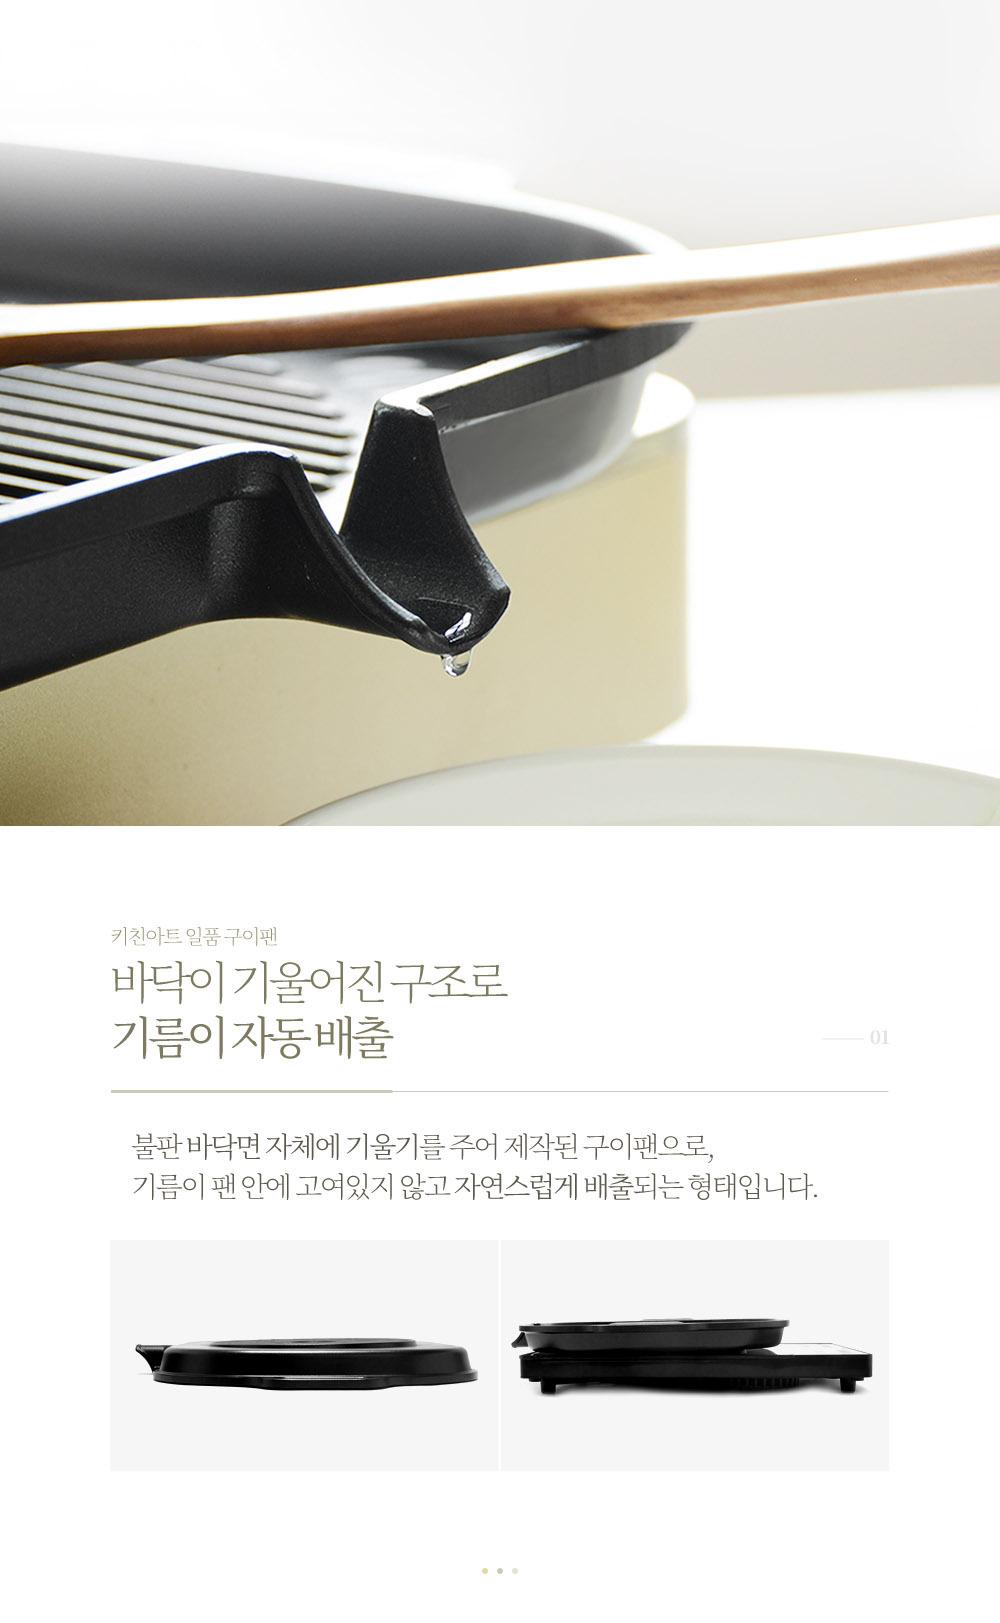 韓國食品-[KitchenArt] Round Induction BBQ Pan Roaster 38.5x30cm